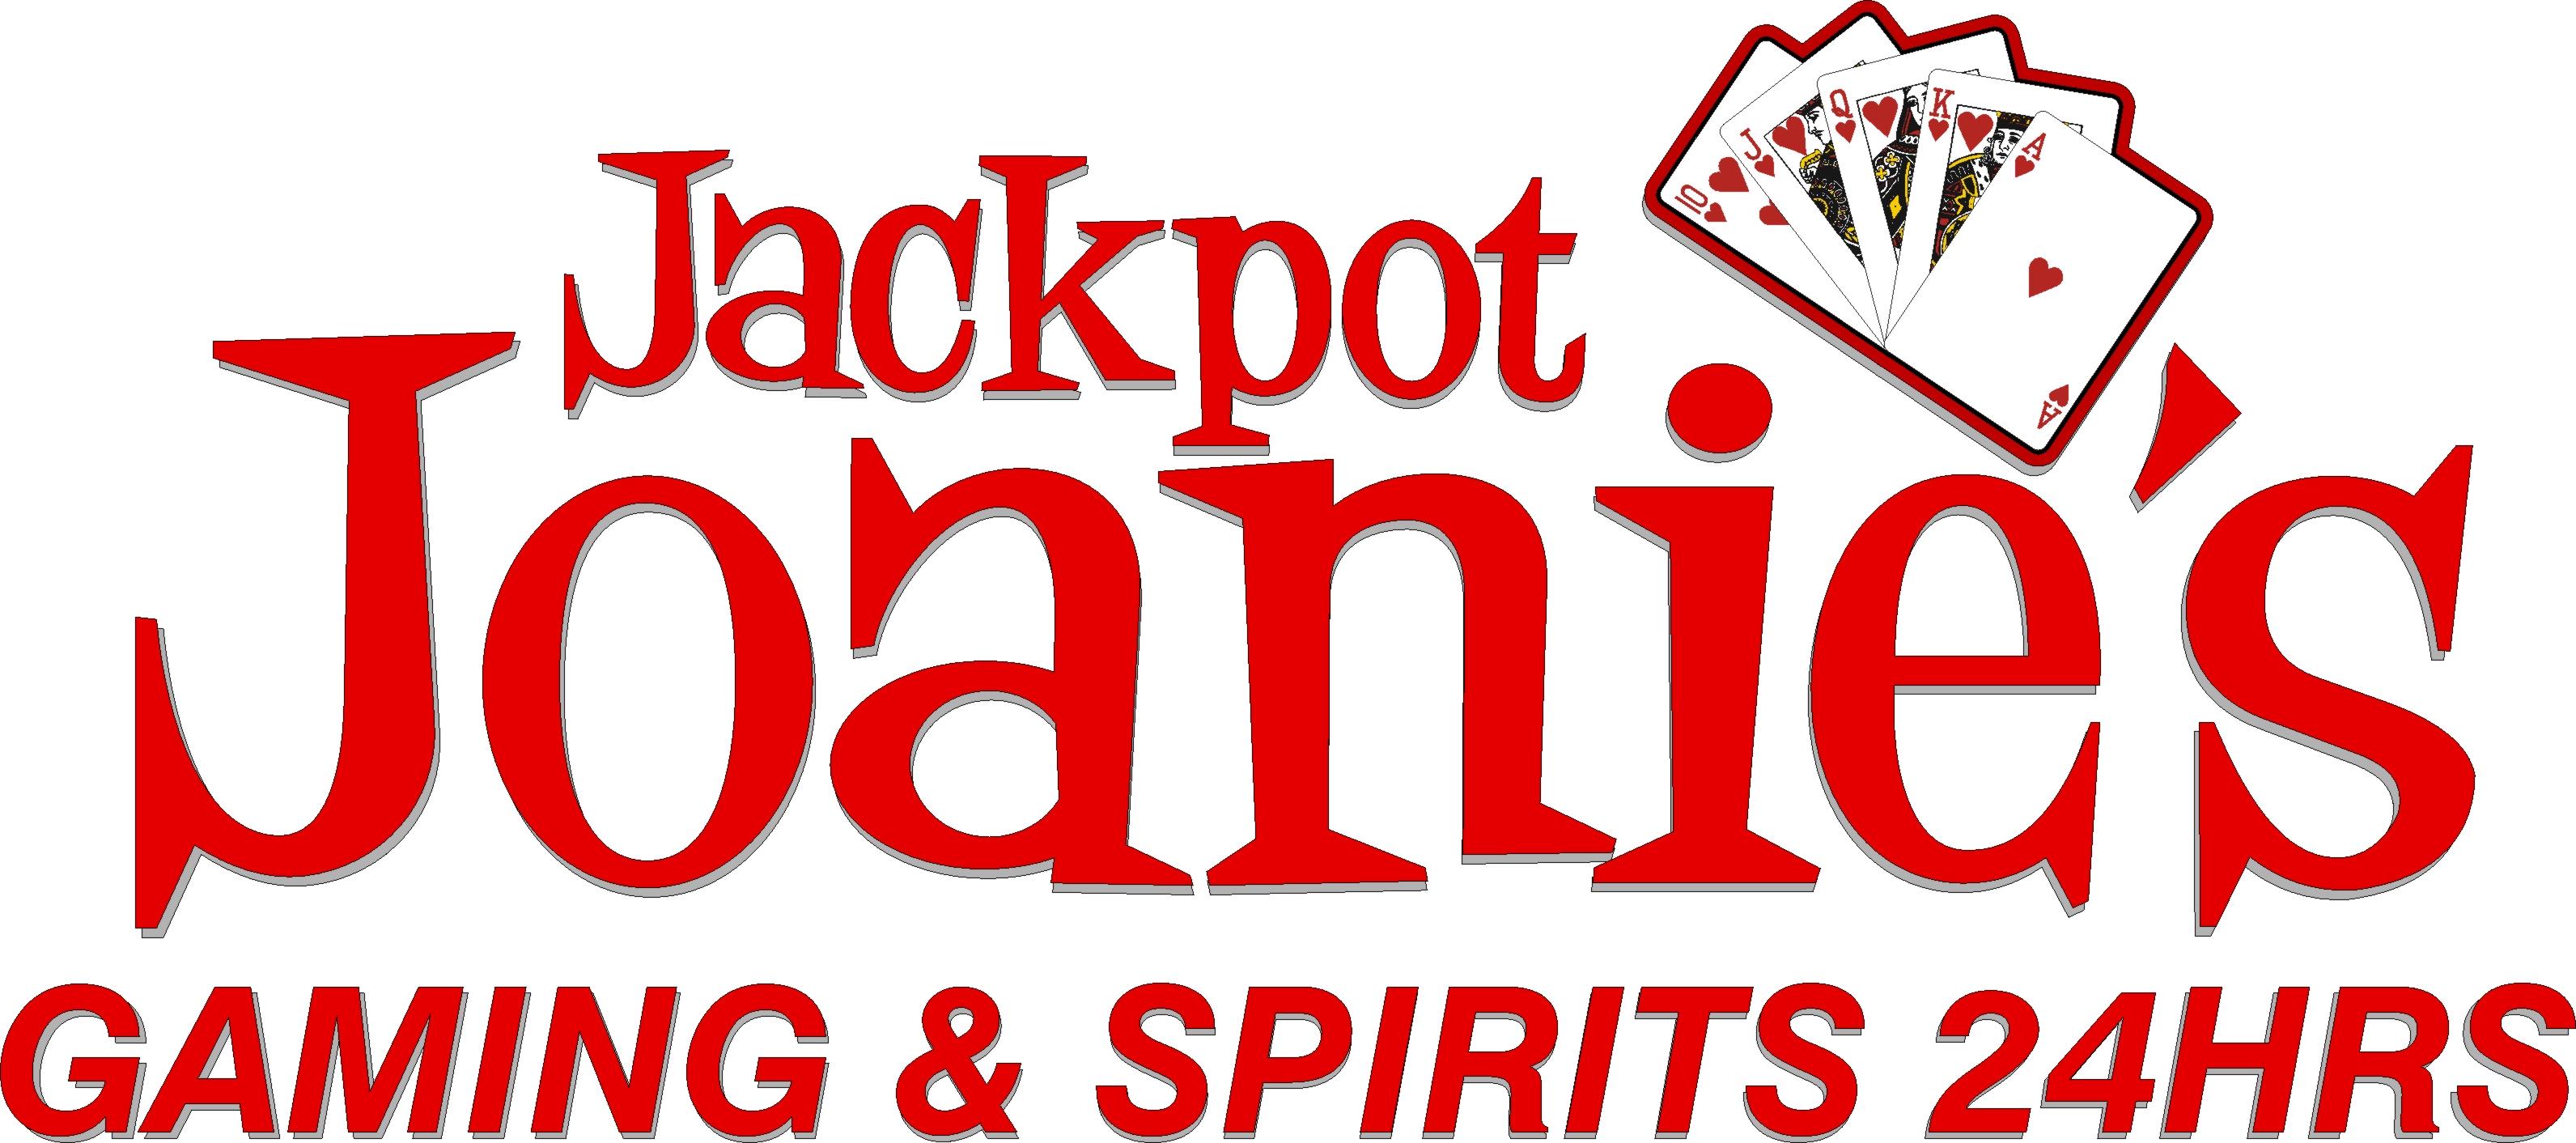 Jackpot Joanies